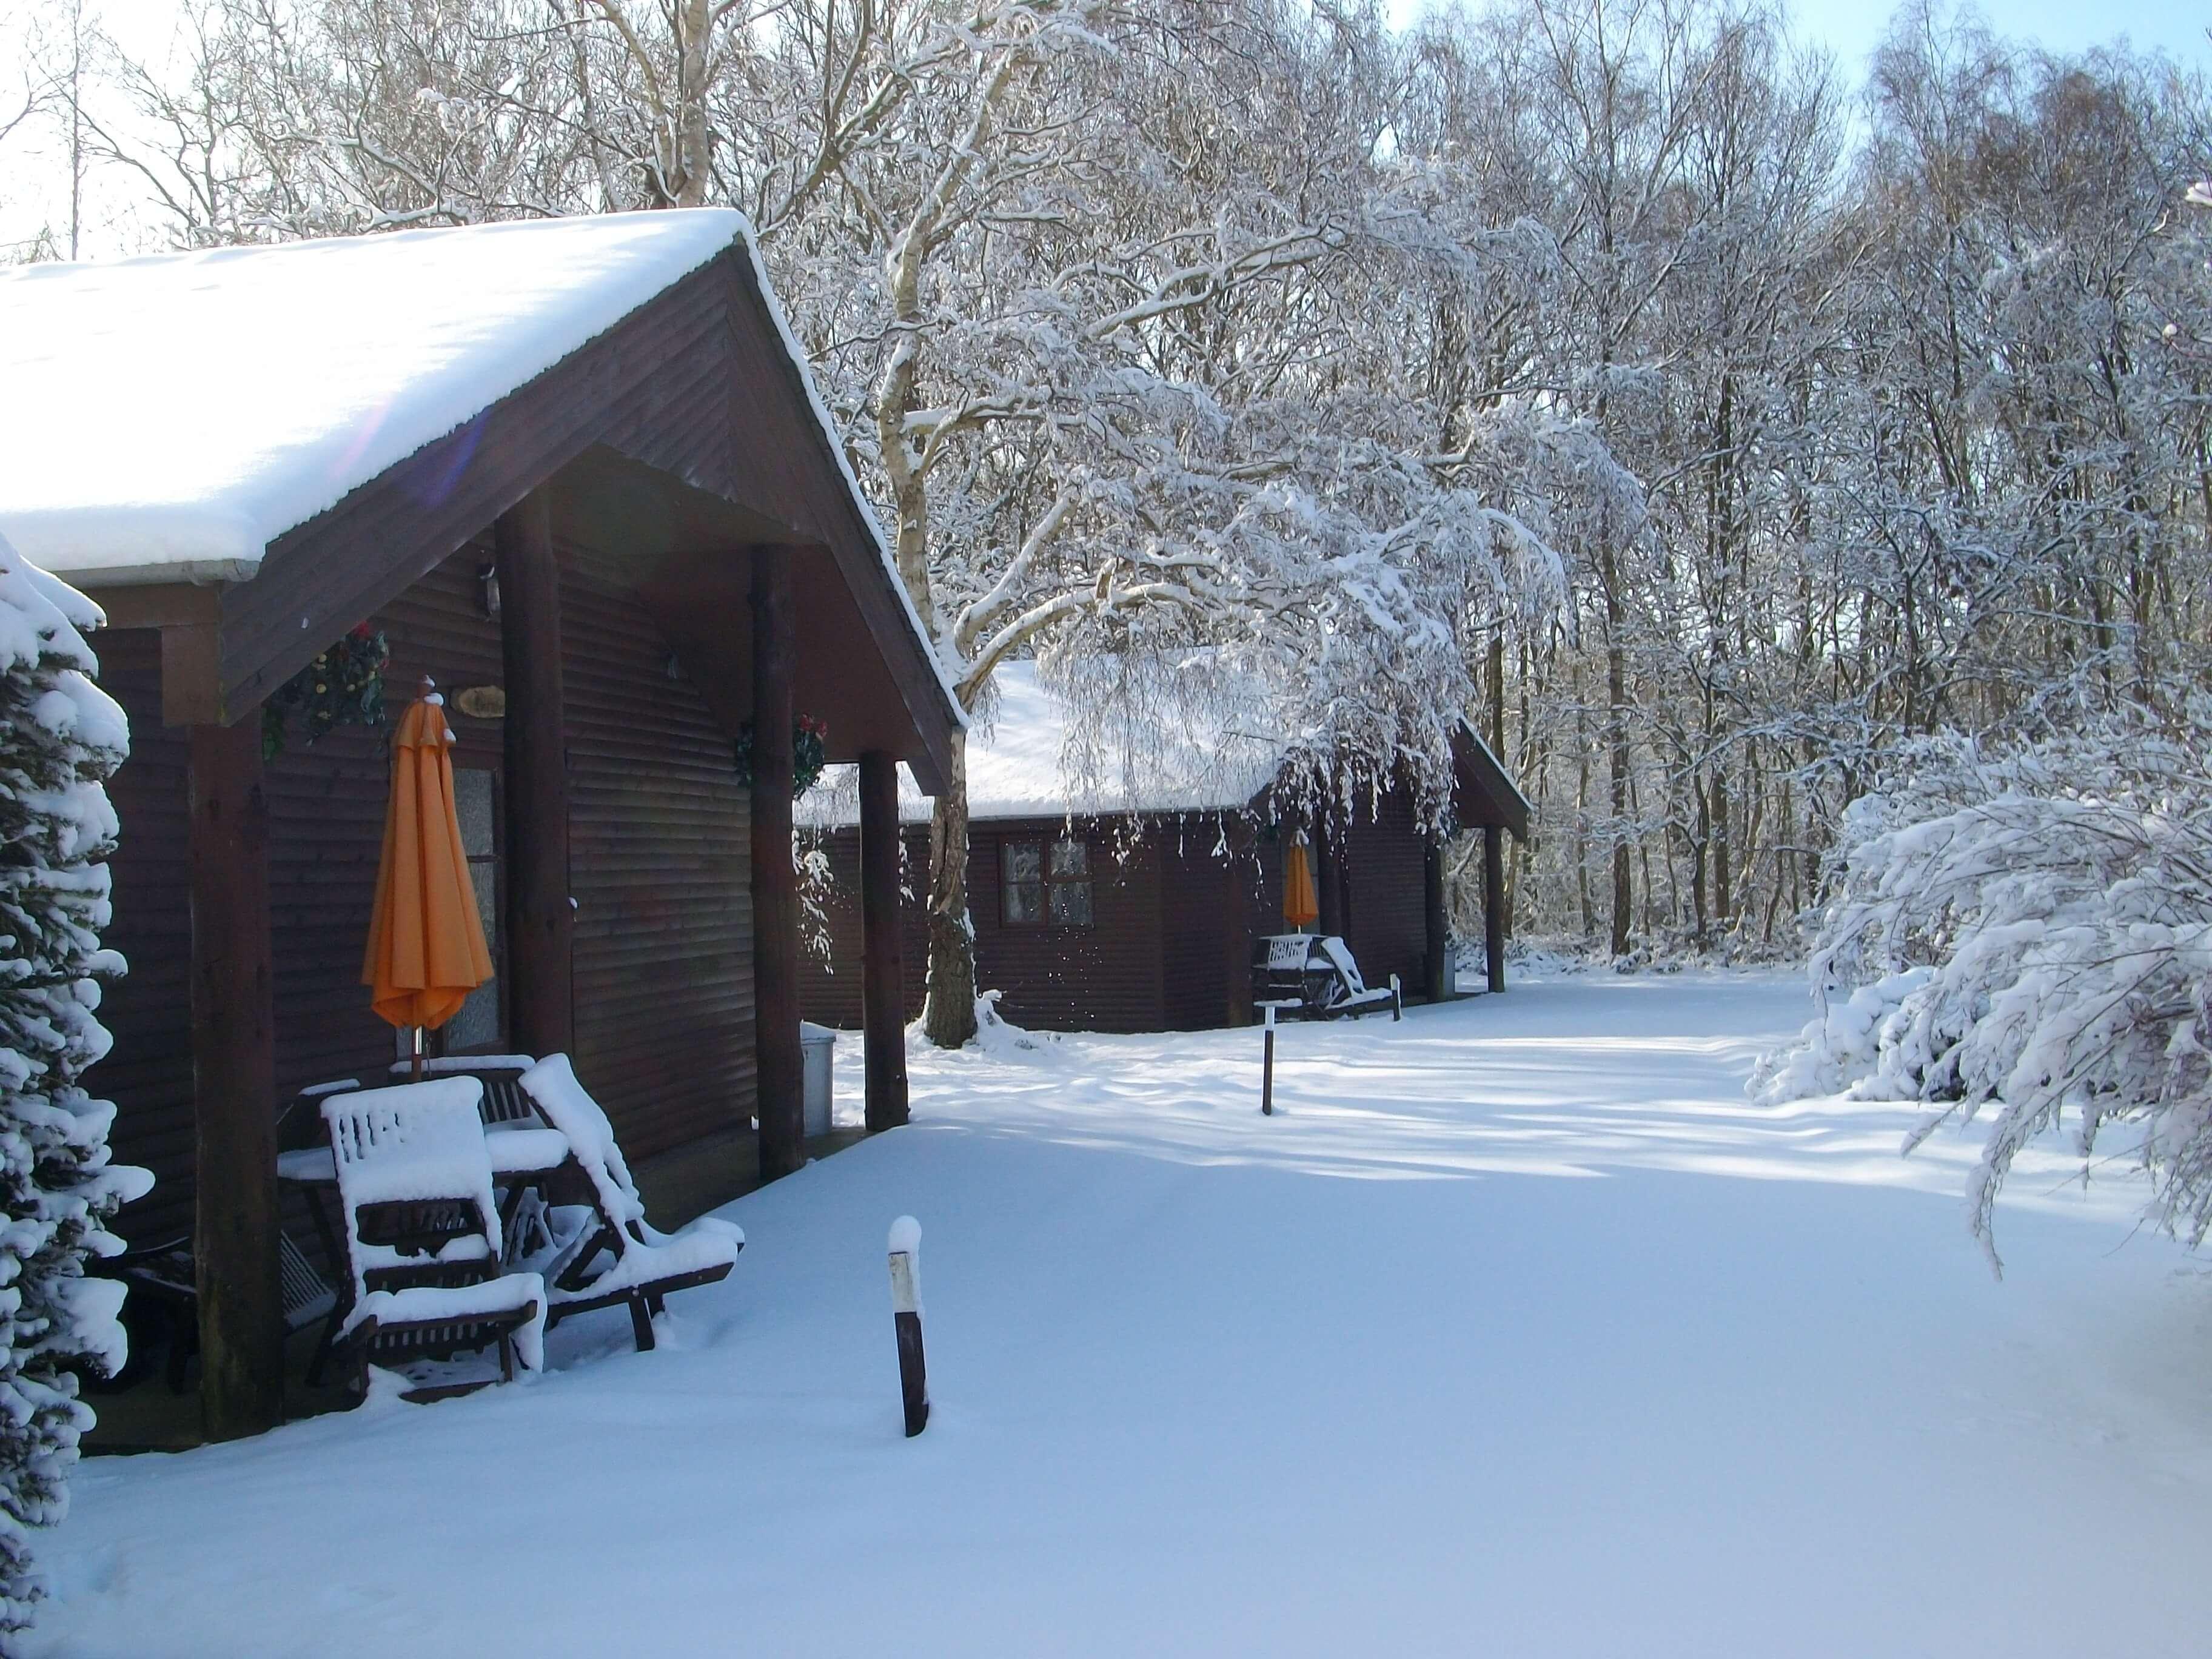 Eversleigh Woodland Lodges Snow